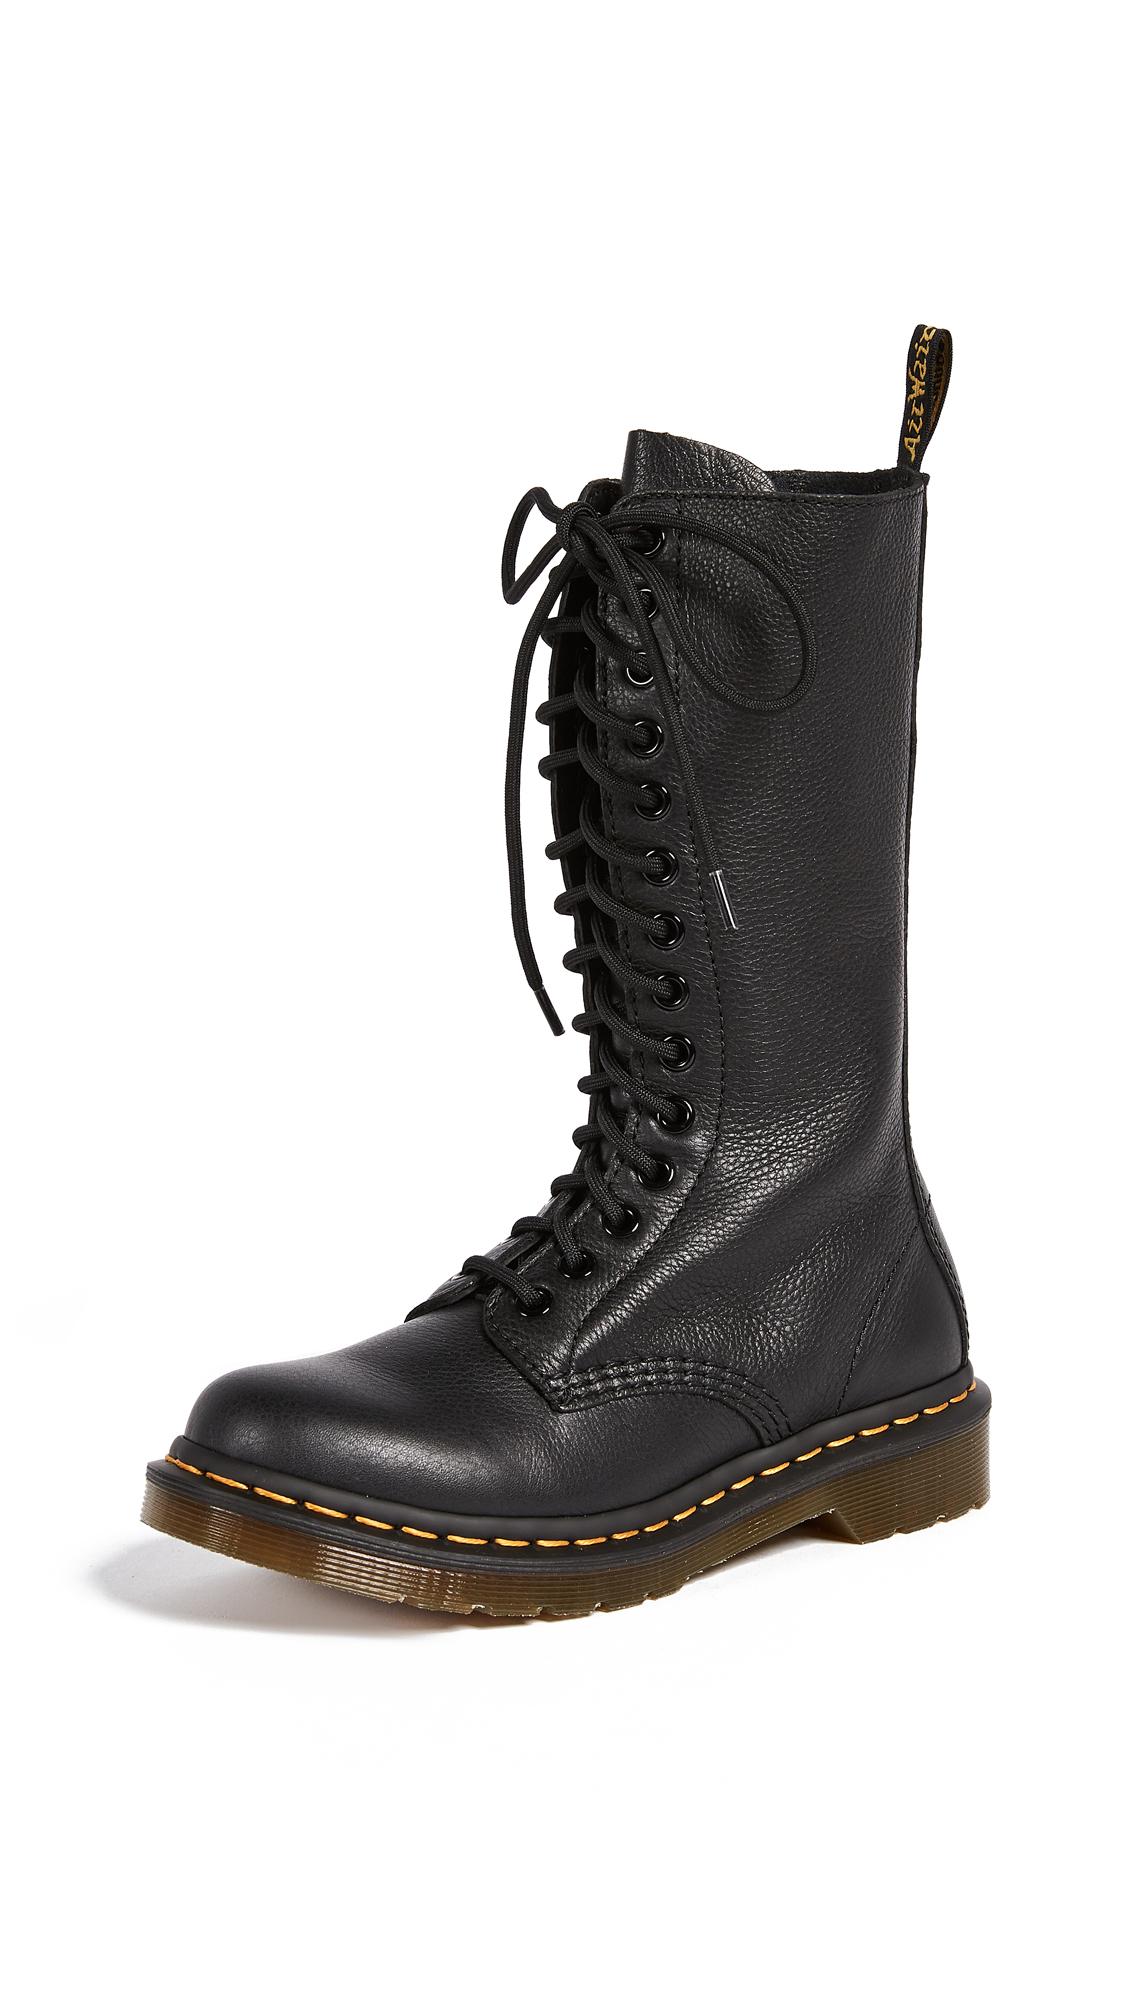 Dr. Martens 1B99 14 Eye Zip Boots - Black